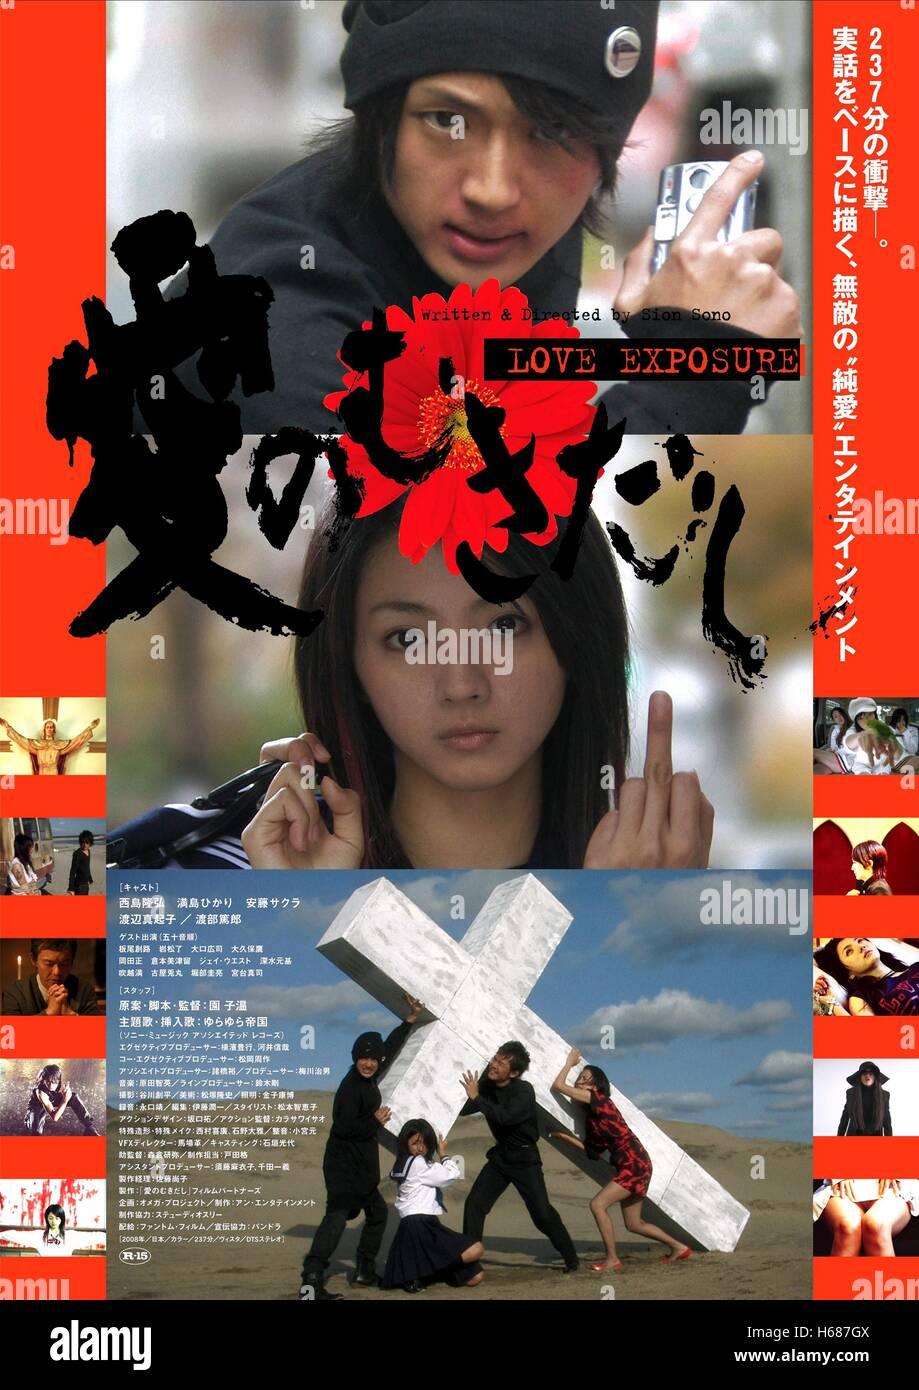 HIKARI MITSUSHIMA & TAKAHIRO NISHIJIMA POSTER LOVE EXPOSURE; AI NO MUKIDASHI (2008) - Stock Image